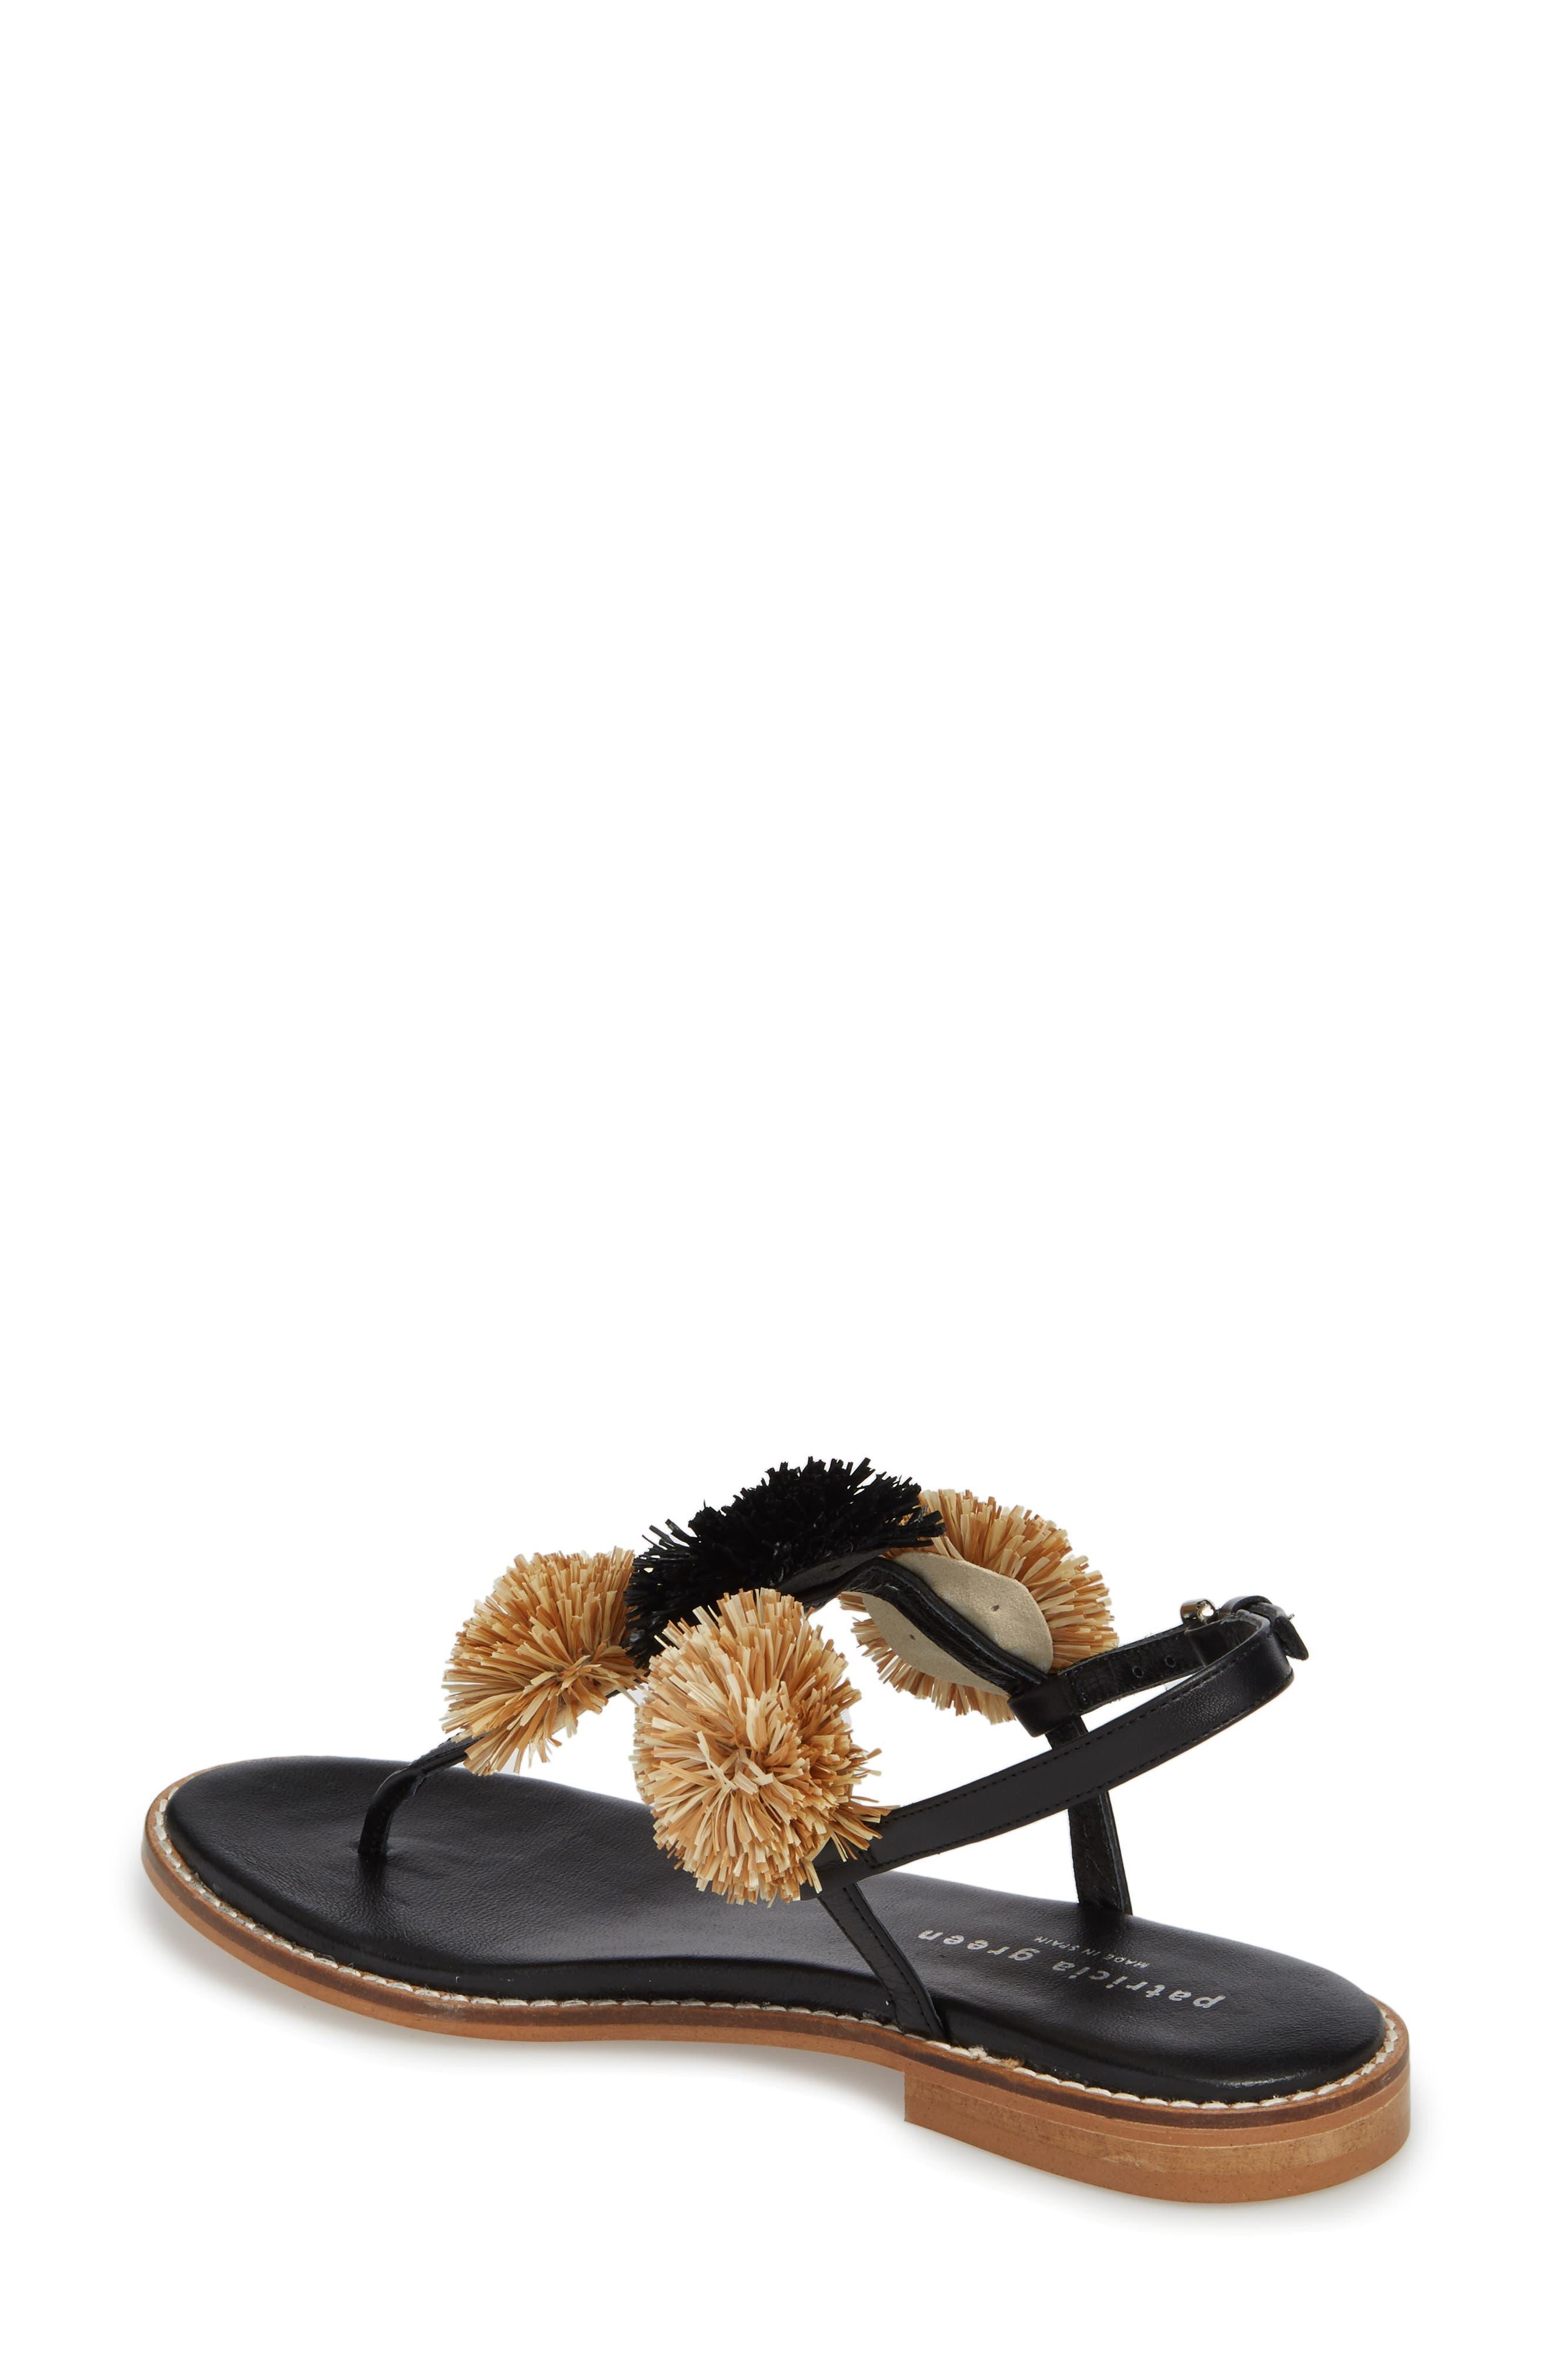 Pompom Thong Sandal,                             Alternate thumbnail 2, color,                             Black Leather